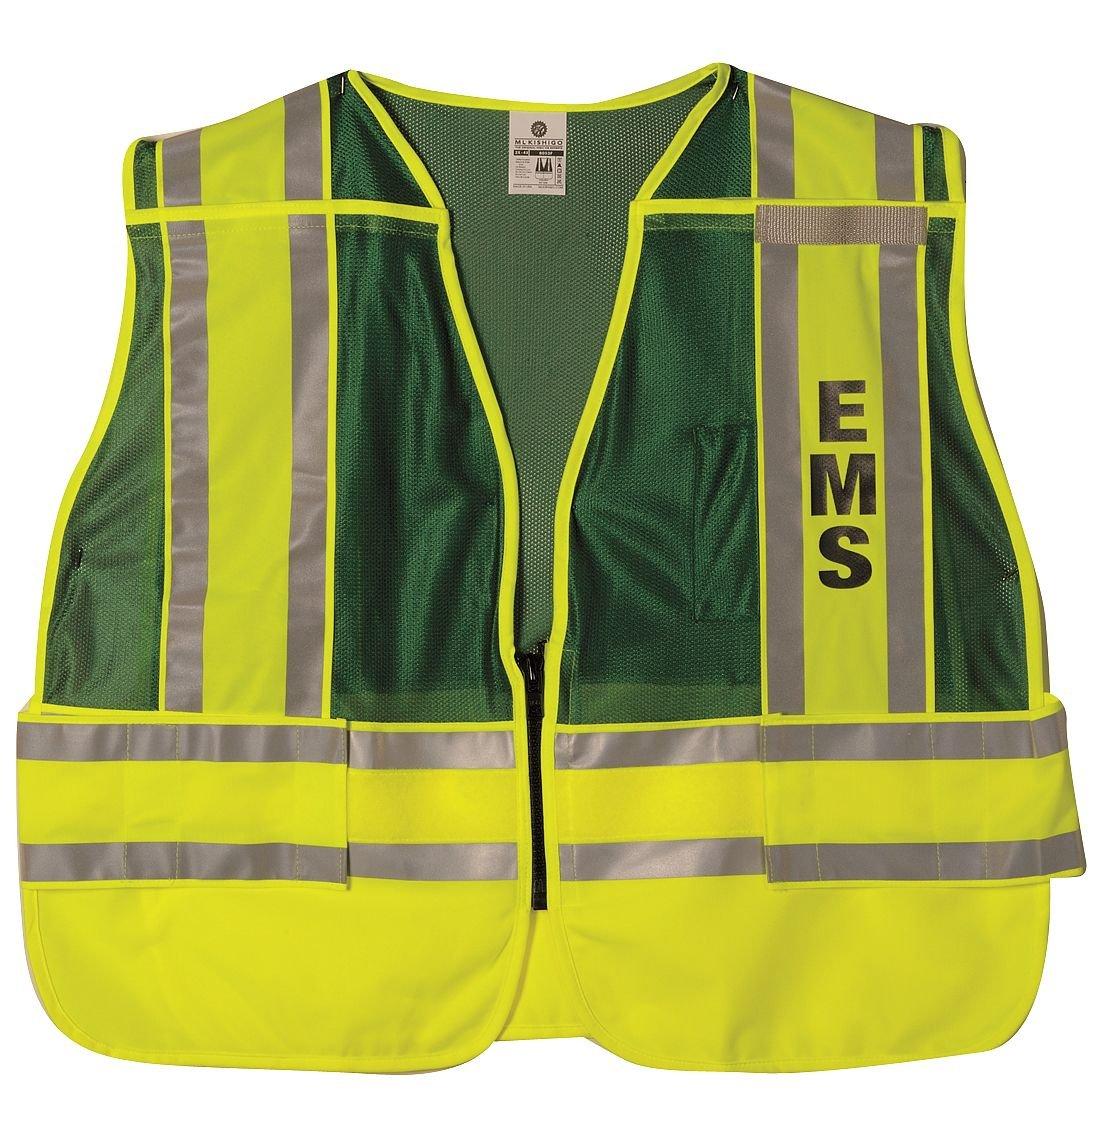 Pro Police Safety Vest Green 2XL//4XL ML KISHIGO 8053FBZ-2X-4X